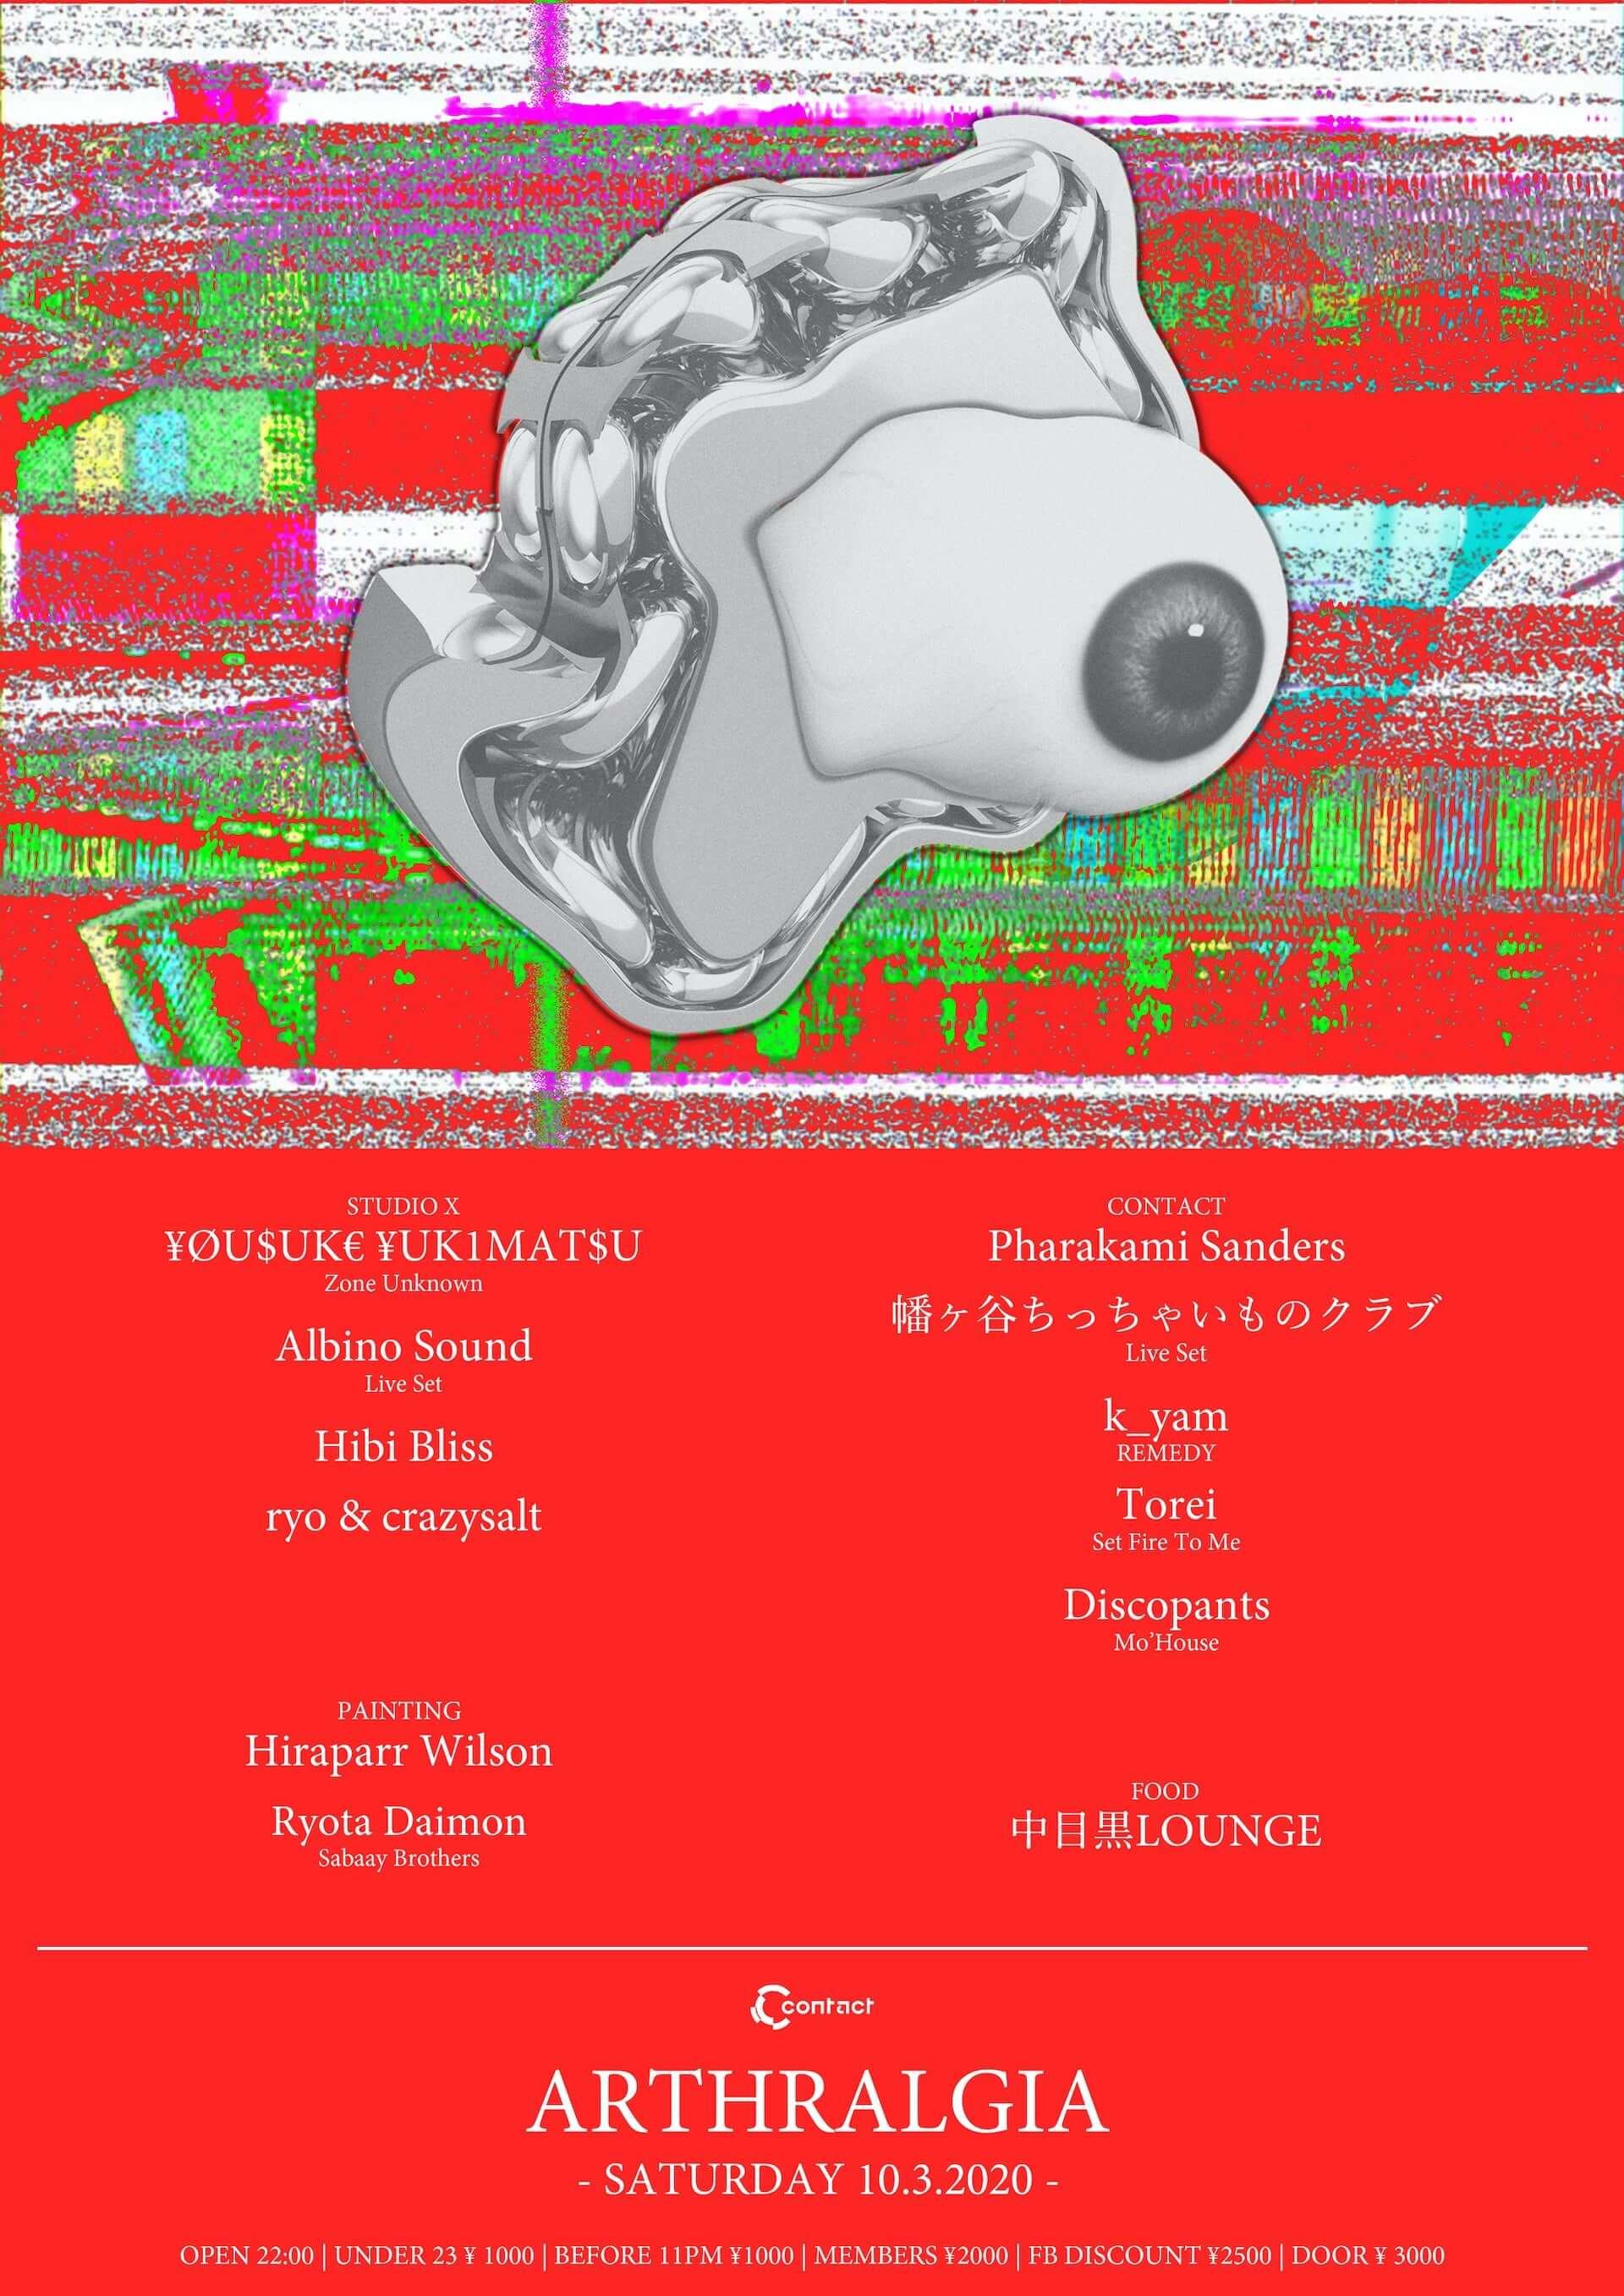 ¥ØU$UK€ ¥UK1MAT$Uが渋谷Contact<ARTHRALGIA>にゲスト出演!Albino Sound、Hibi Blissも登場 music200929_yousuke-yukimatsu_1-1920x2715